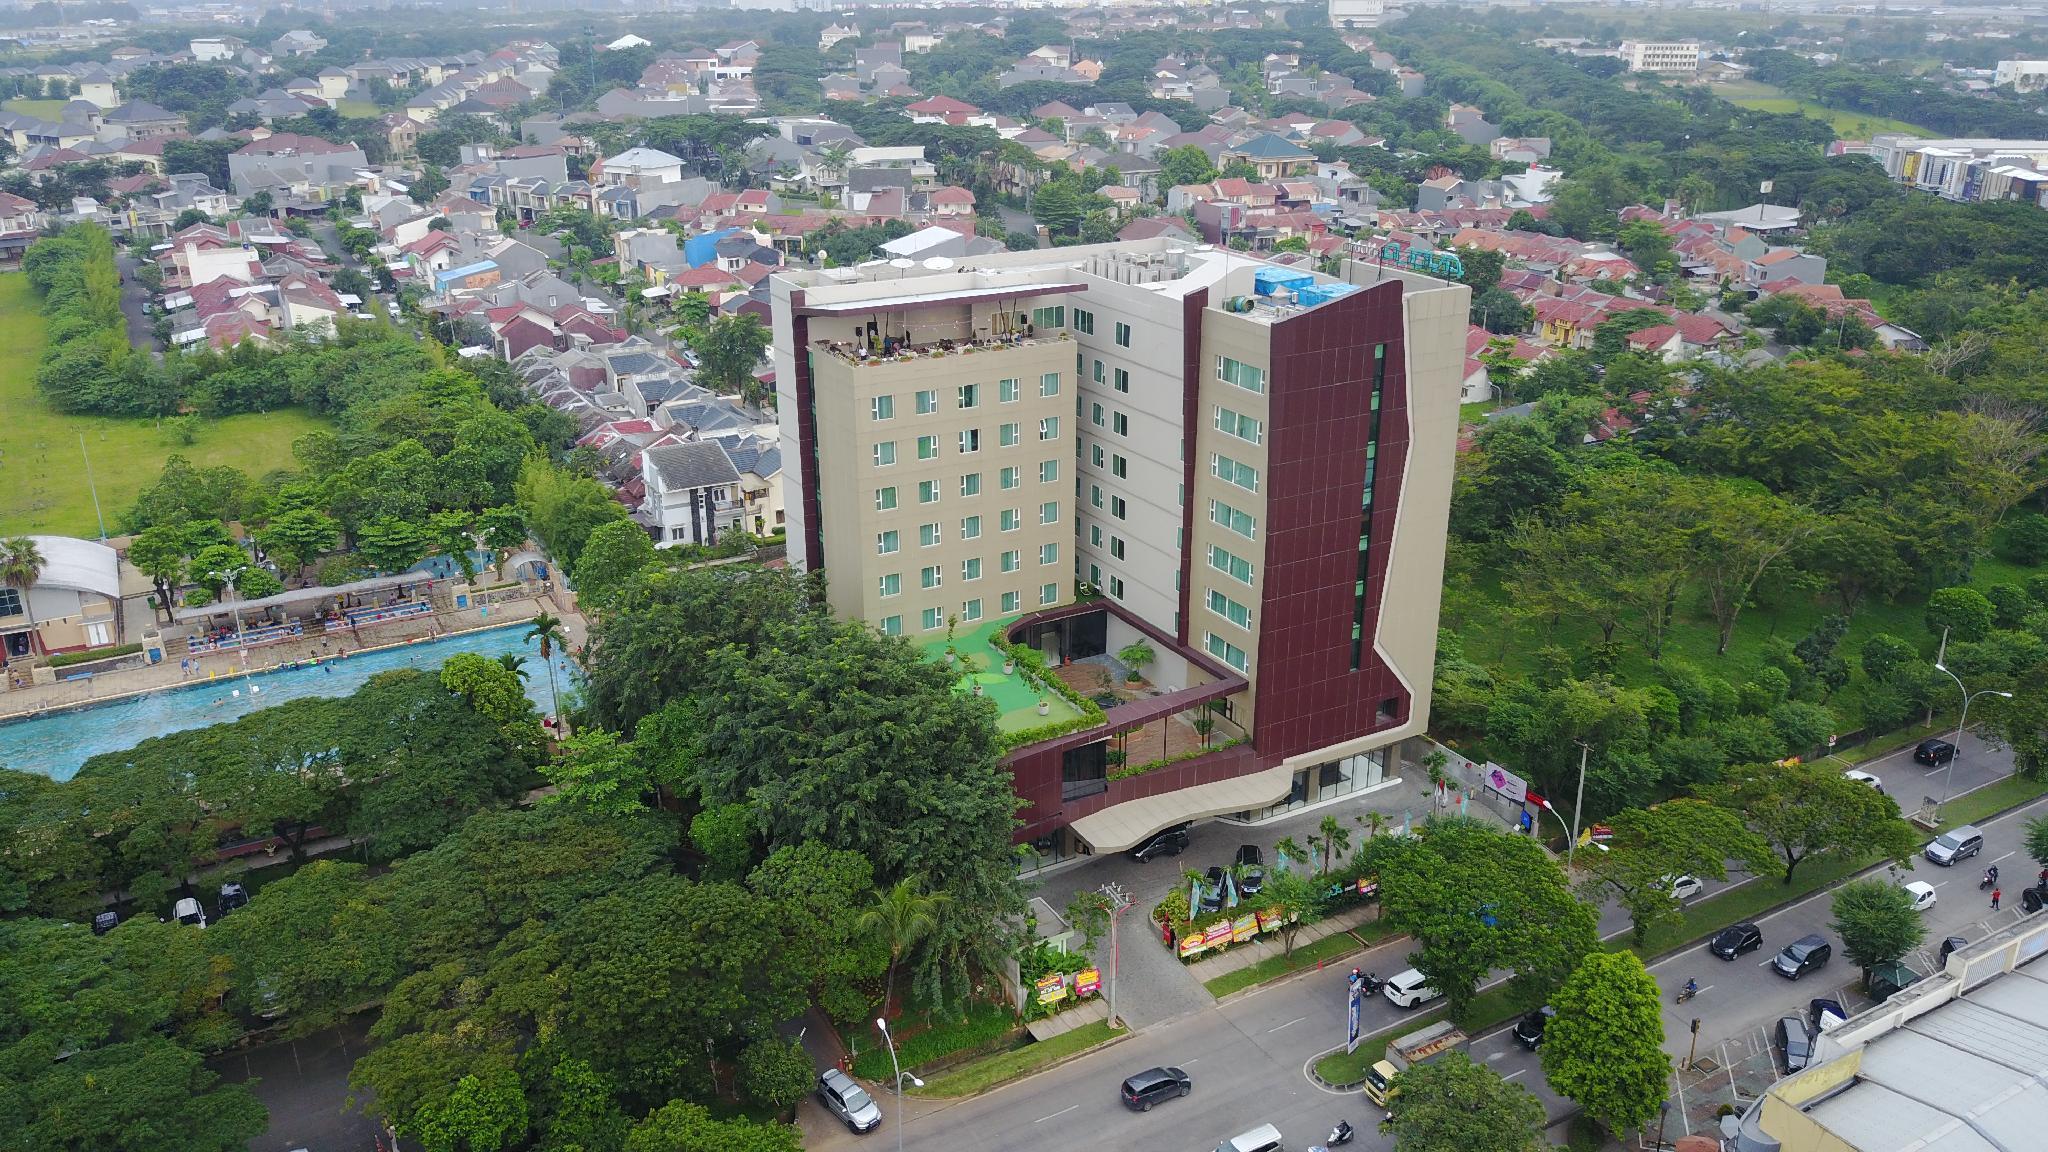 Hotel AYOLA Lippo Cikarang